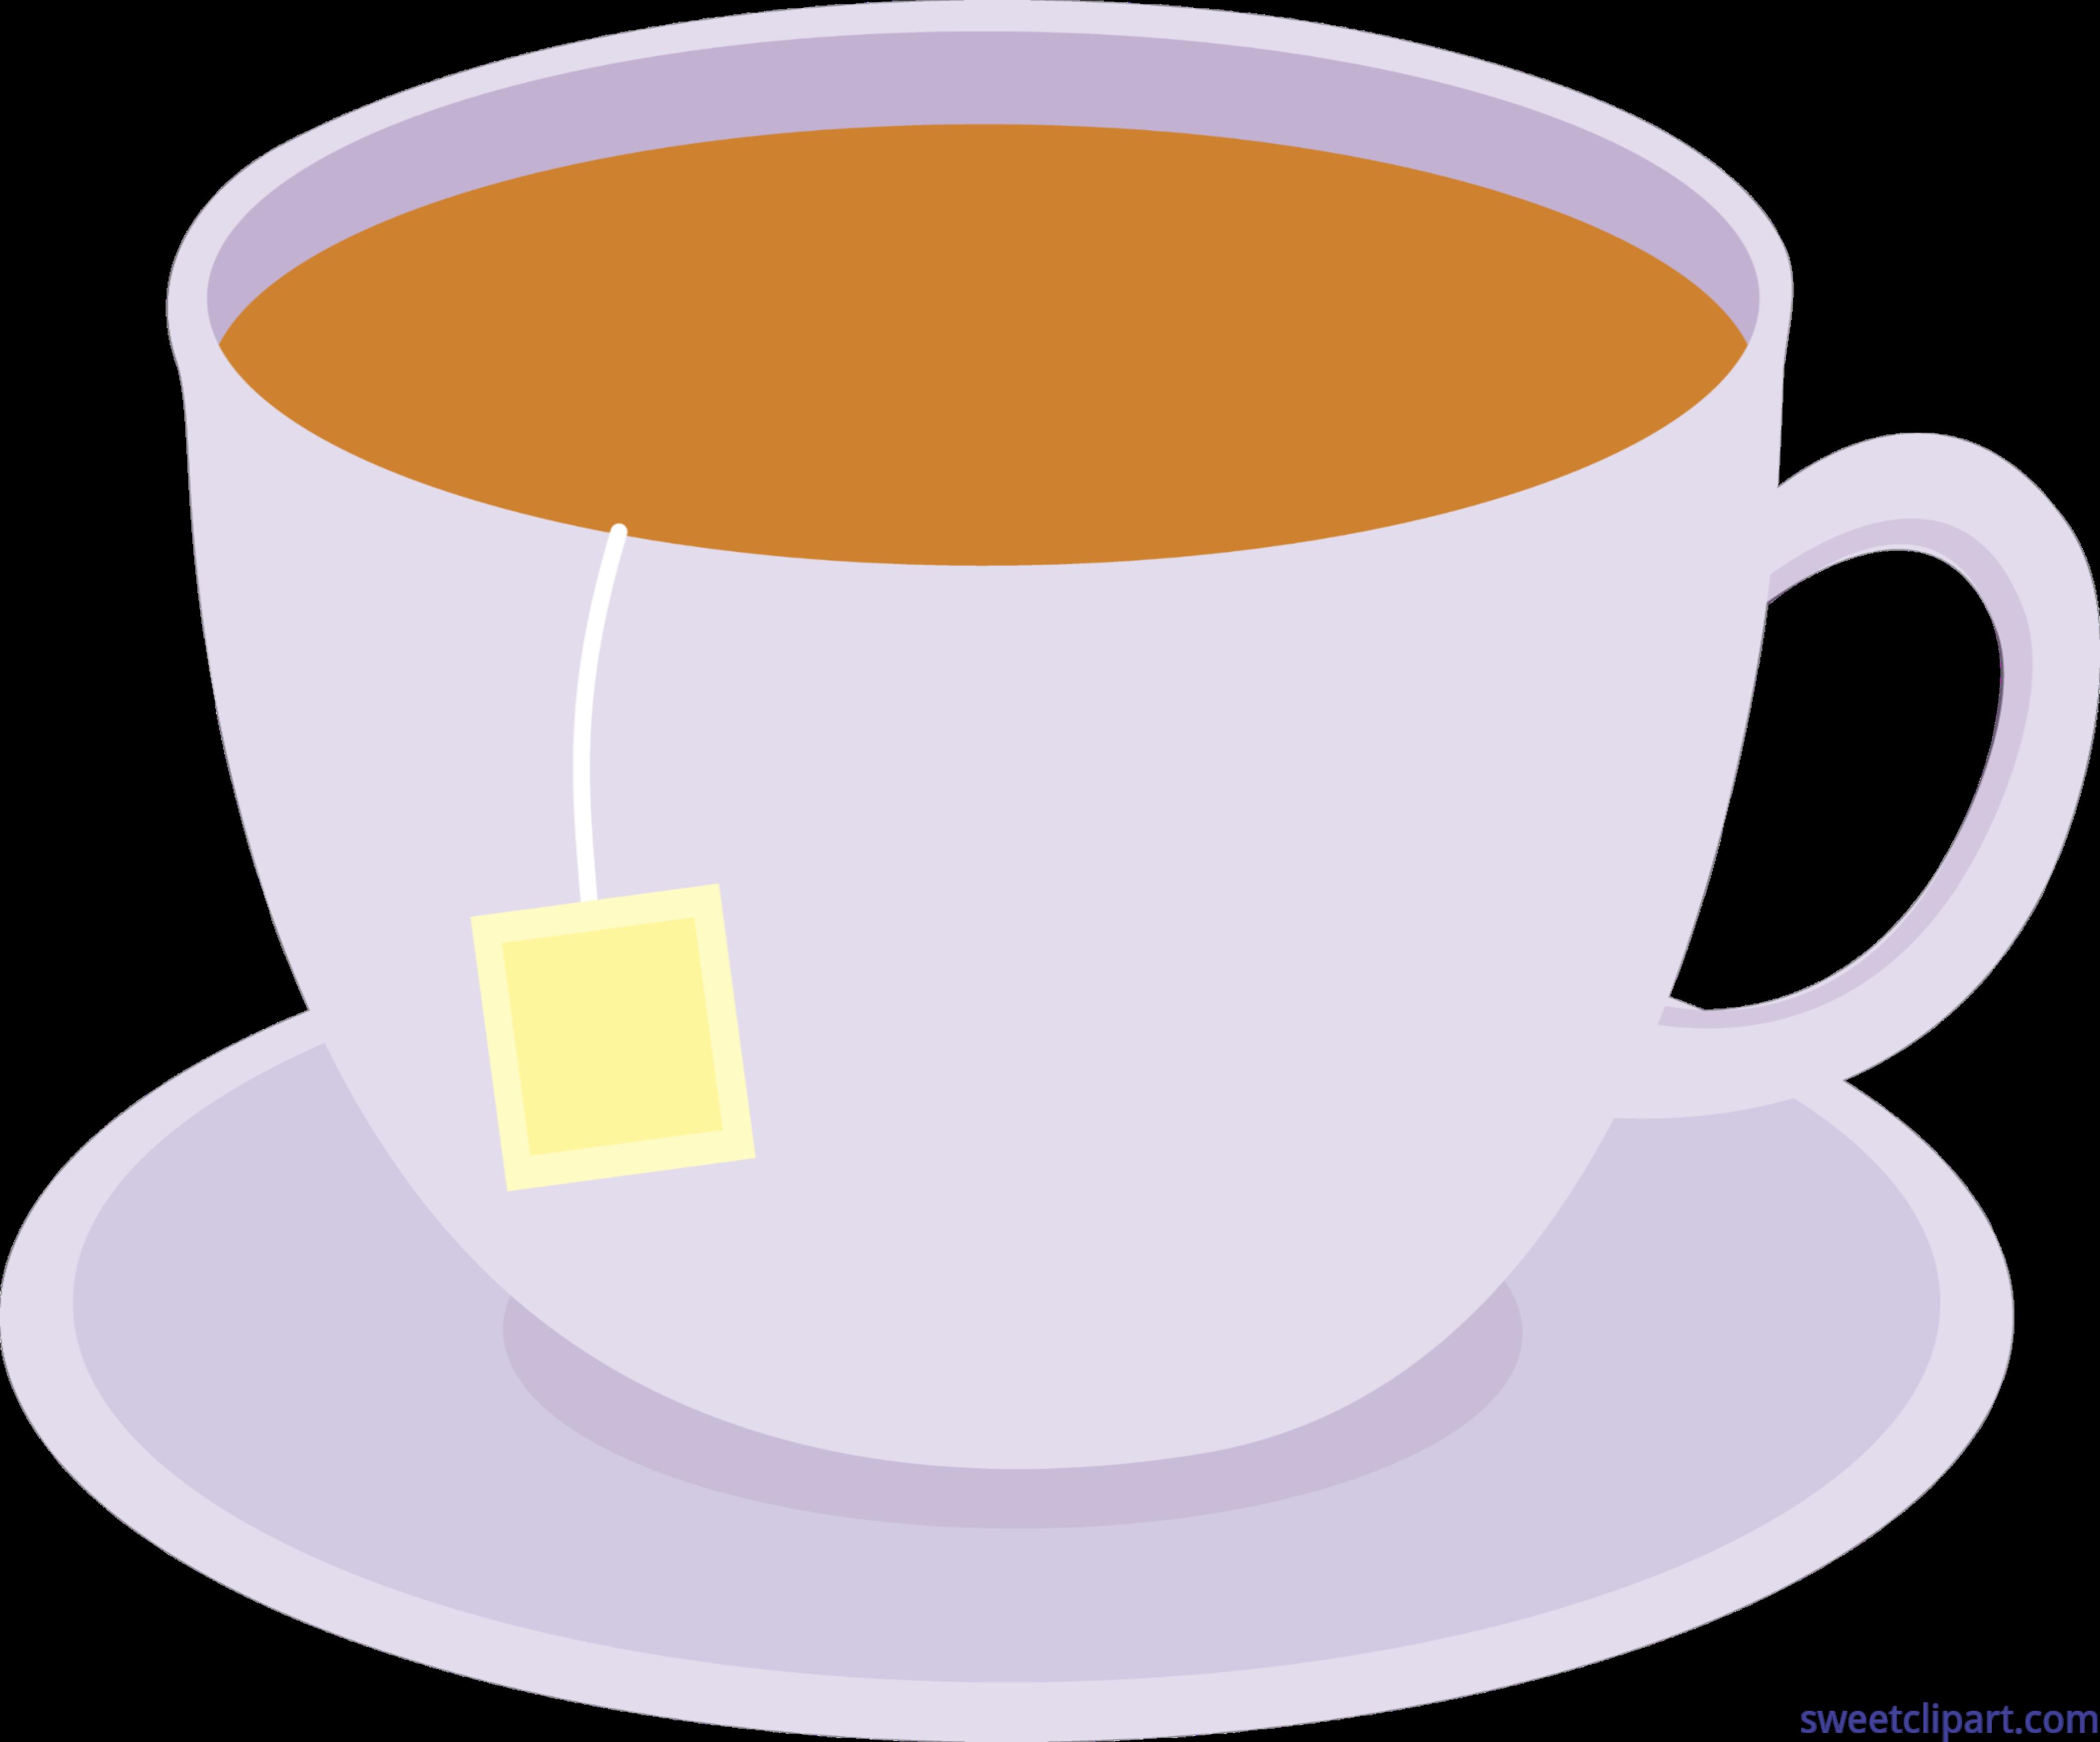 4173x3462 Cup Of Tea On Dish 1 Clip Art